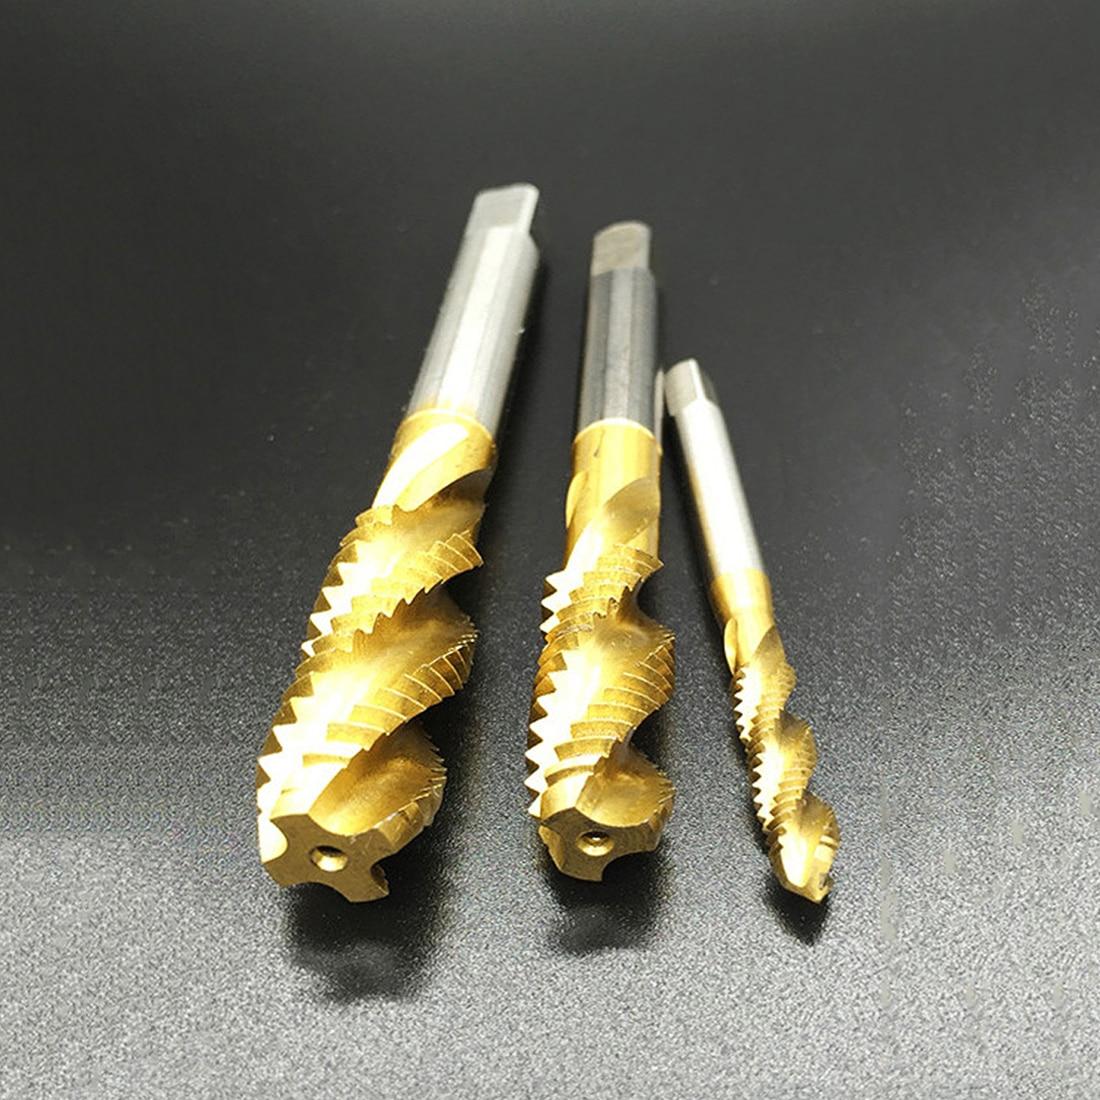 5pcs/set M3 M4 M5 M6 M8 High Speed Steel HSS Screw Thread Metric Spiral Hand Plug Tap Kit Hand Tool